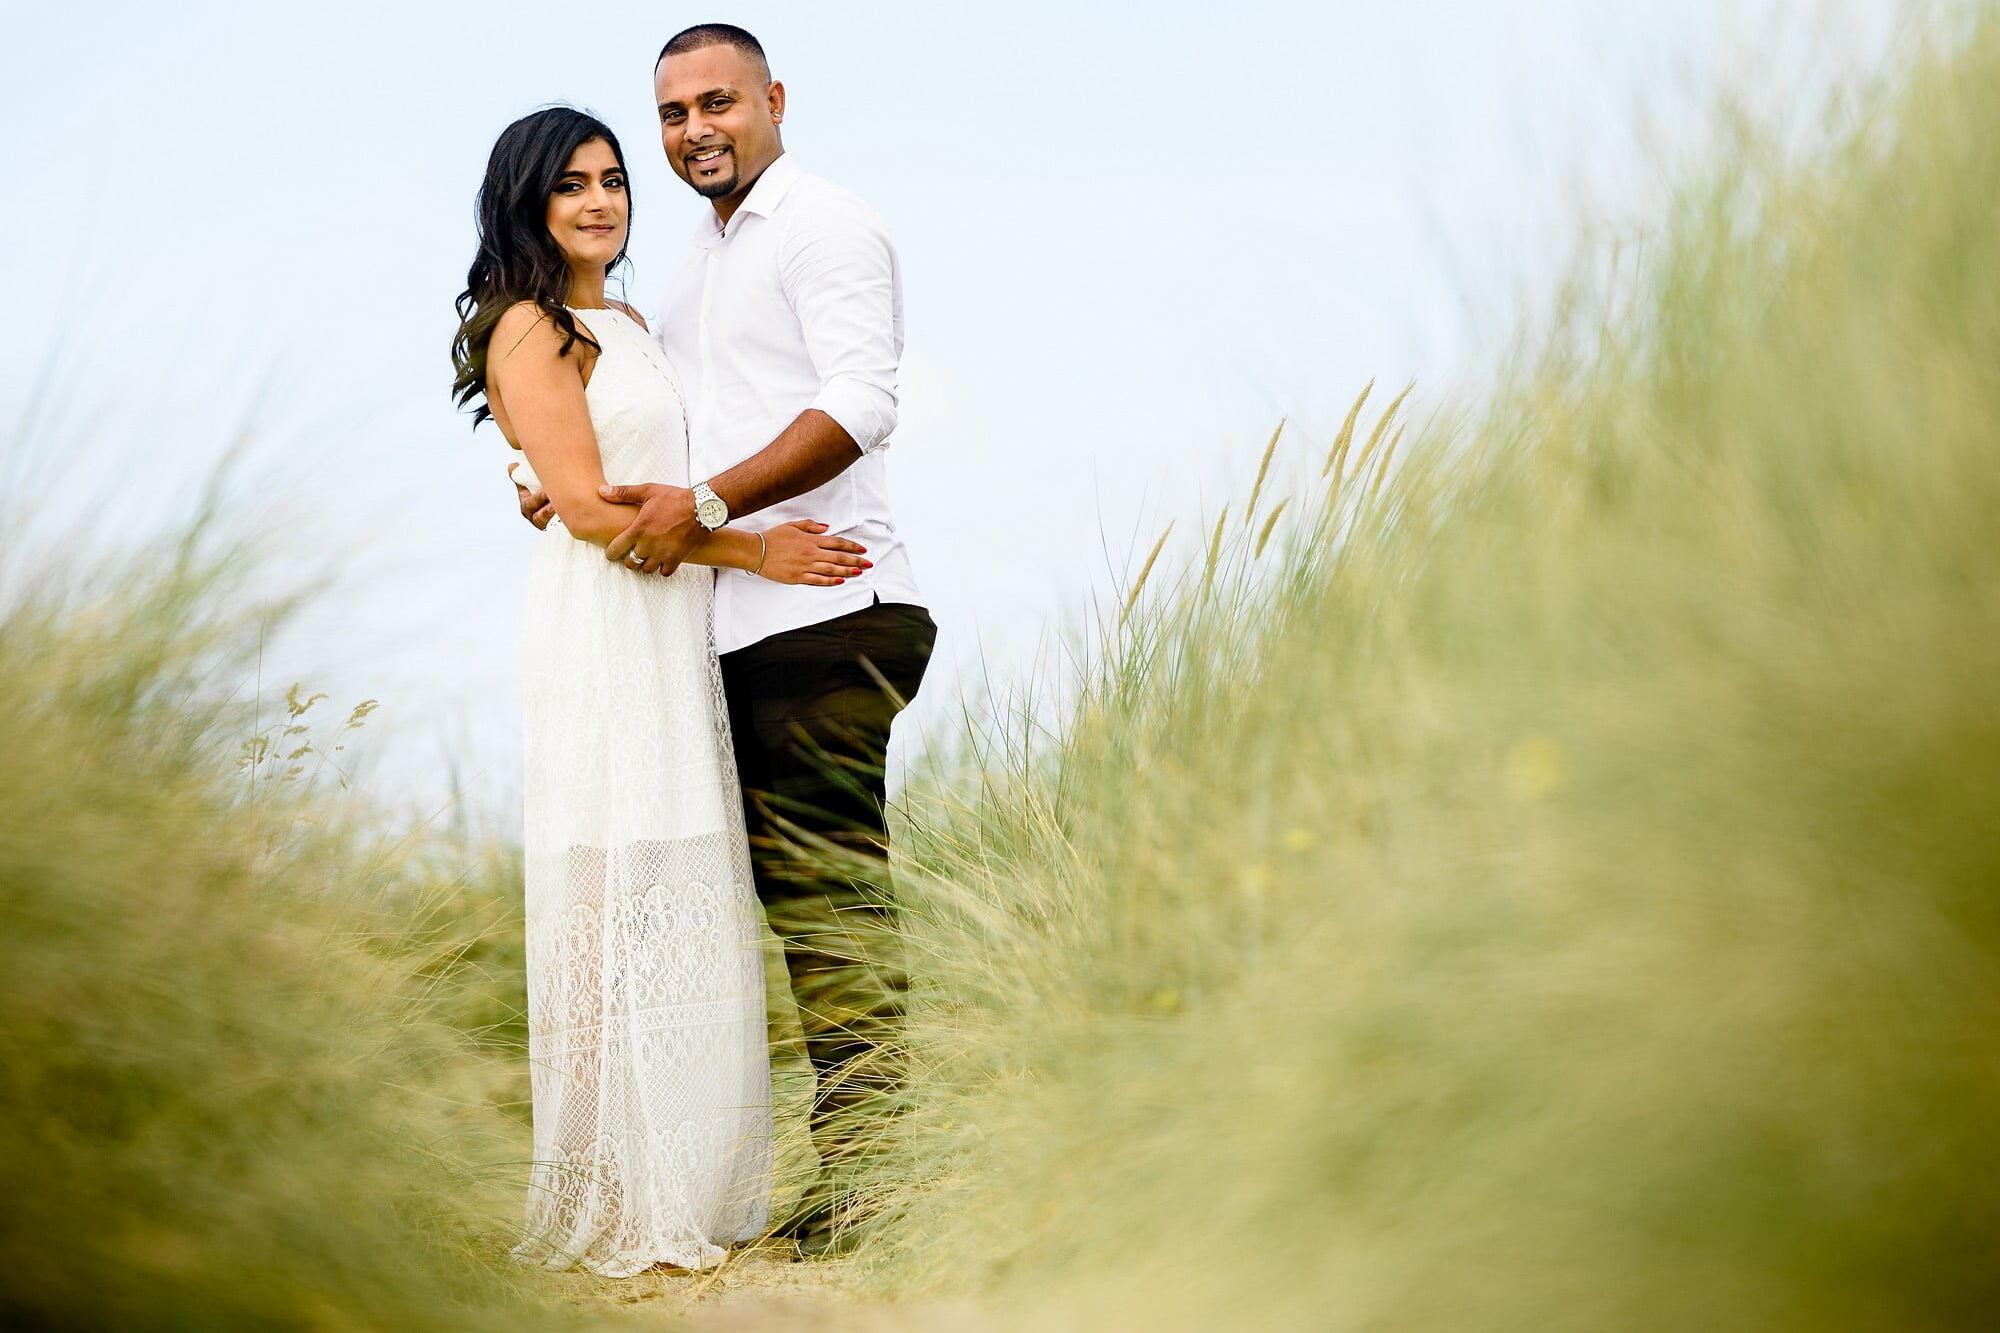 st-michaels-mount-wedding-proposal-9